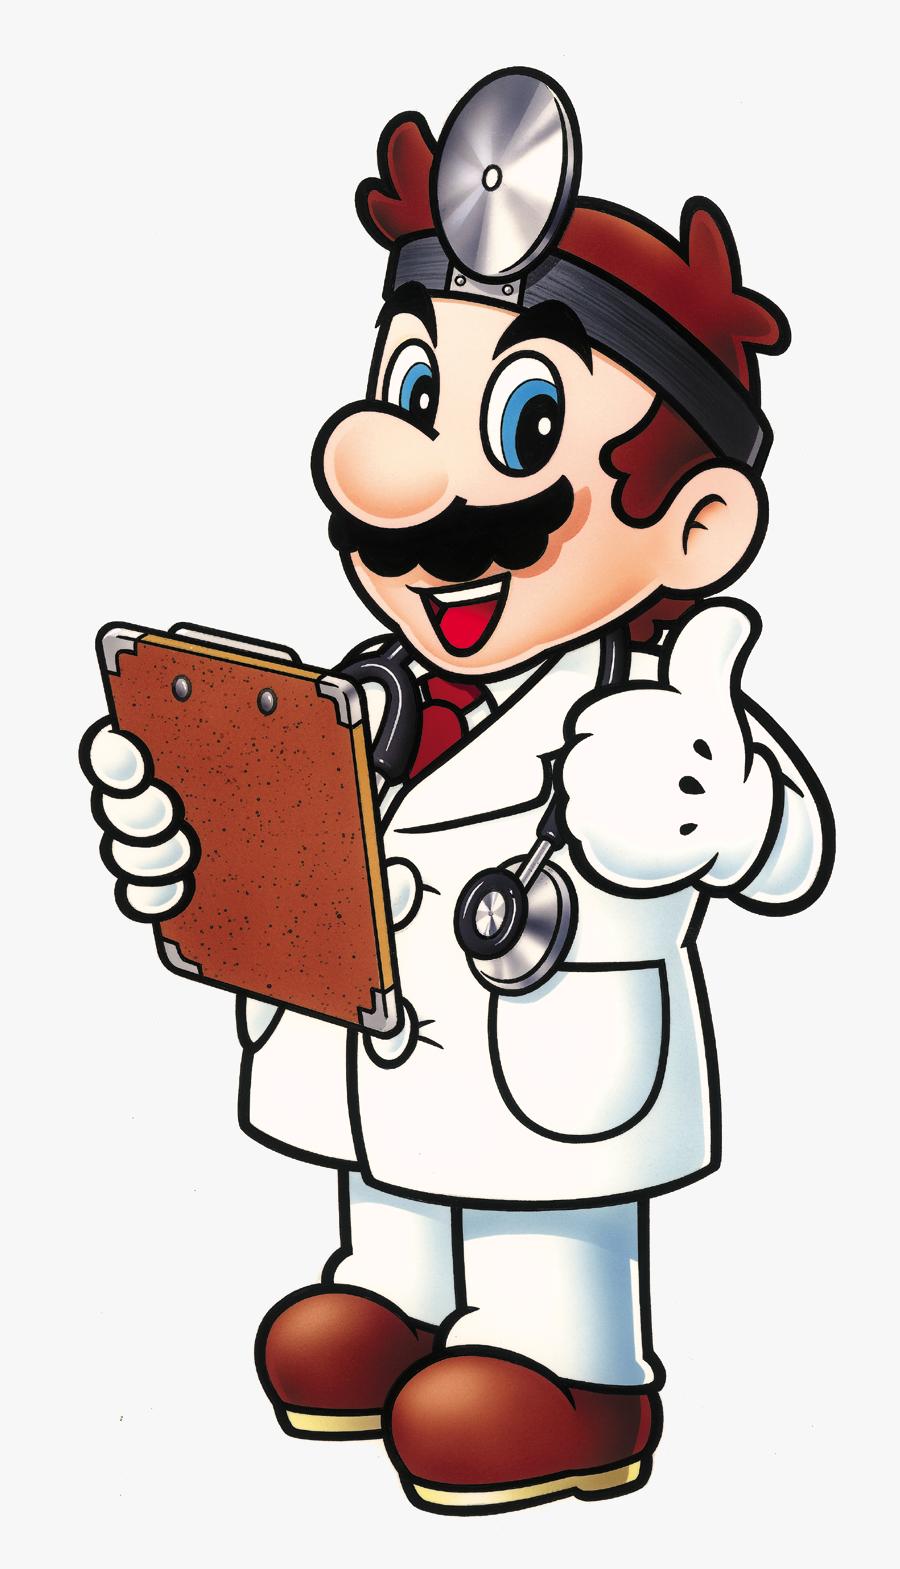 Nintendo Clipart Mario Character Dr Mario Thumbs Up Free